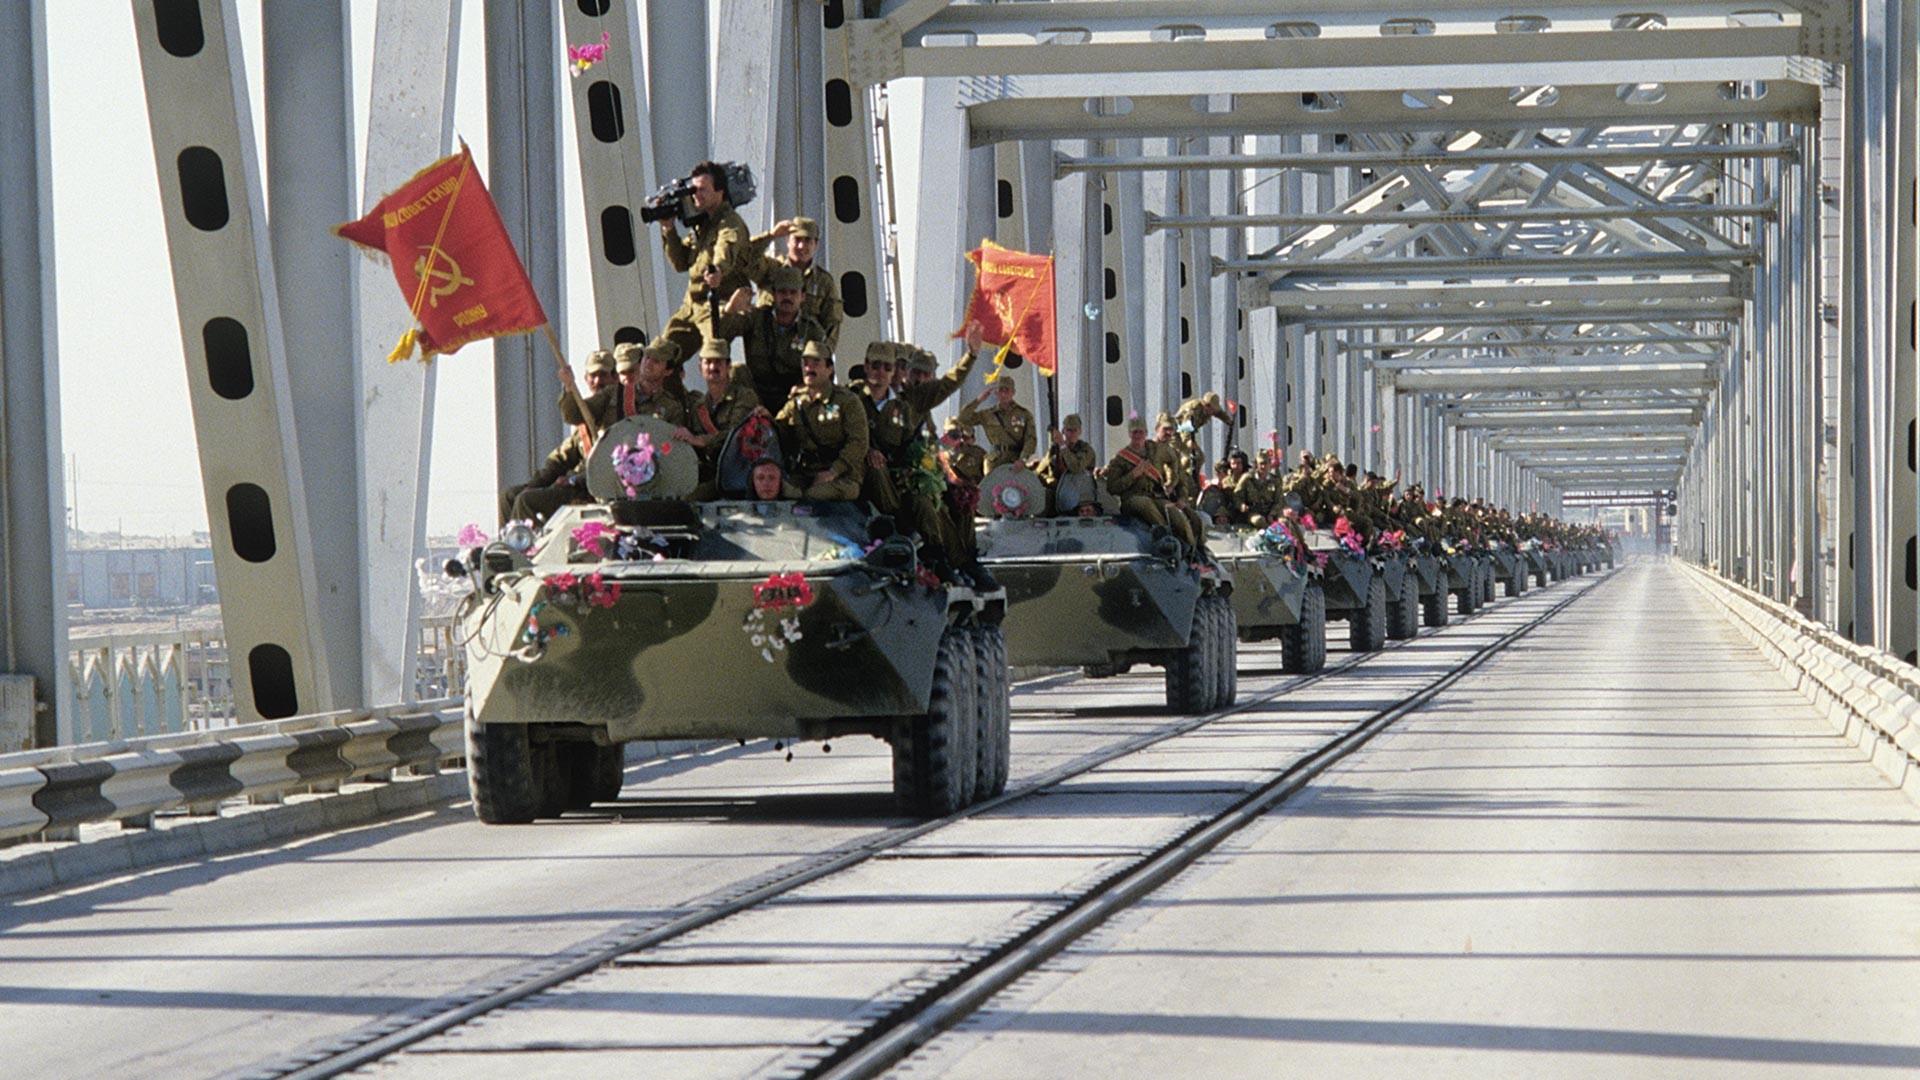 A column of armored vehicles crosses the Afghan-Soviet border through the Friendship bridge lying over the Amu Darya river.